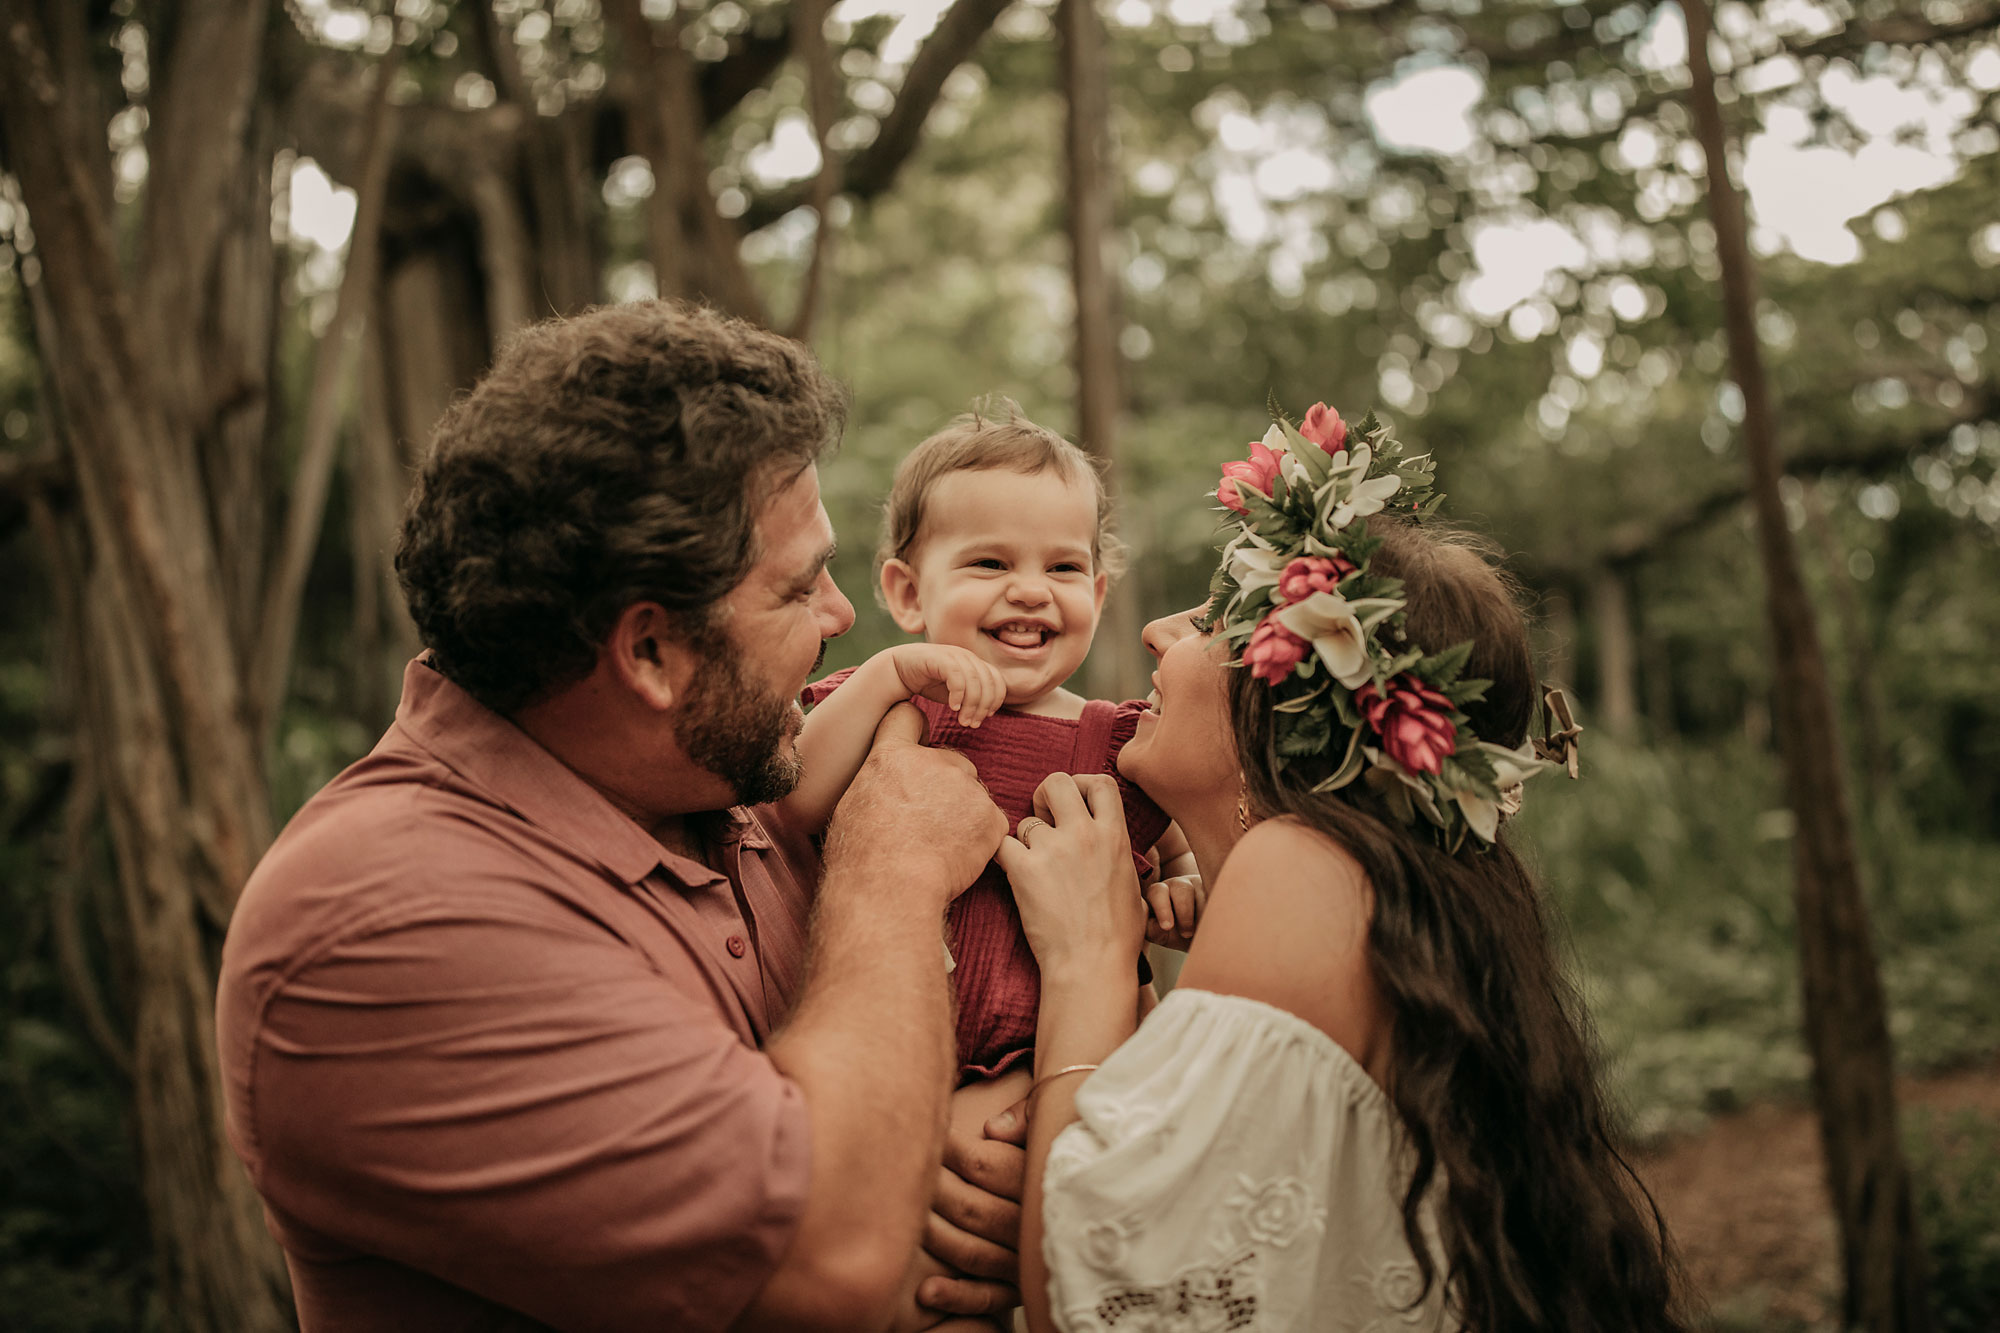 Hawaii-Oahu-Maternity-Photography-The-Sophia-Co-005.jpg